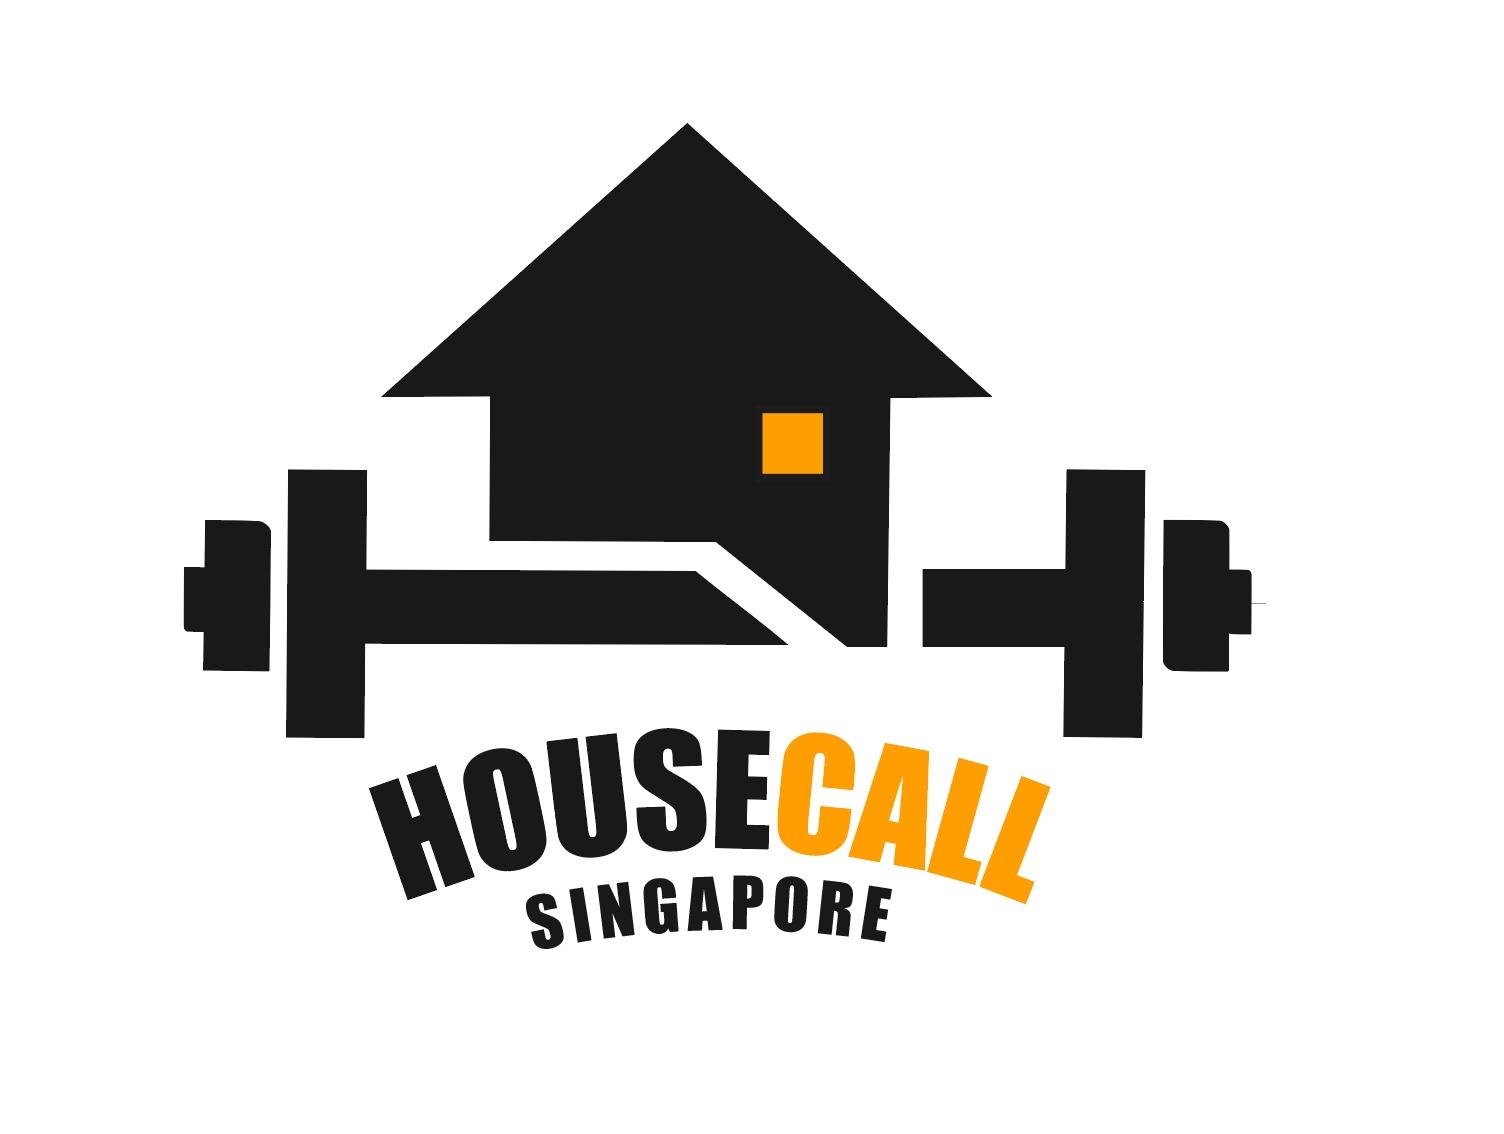 SINGAPORE HOUSECALL PERSONAL TRAINING PTE. LTD.